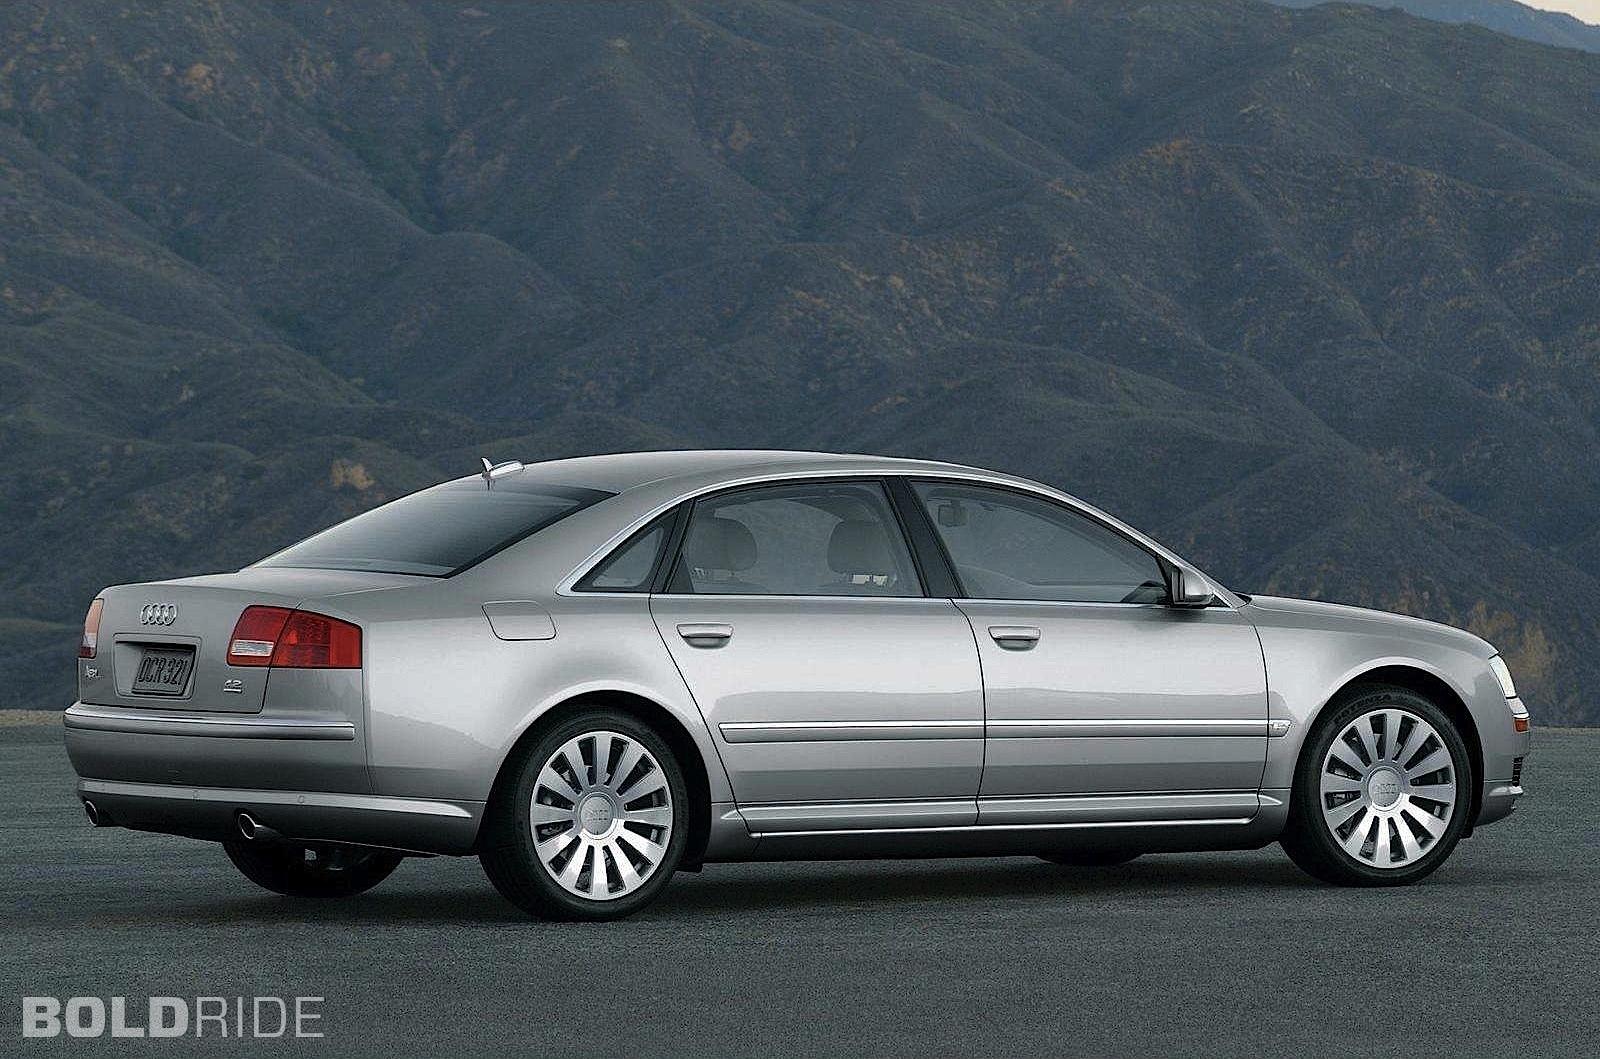 2005 Audi A8 Image 8